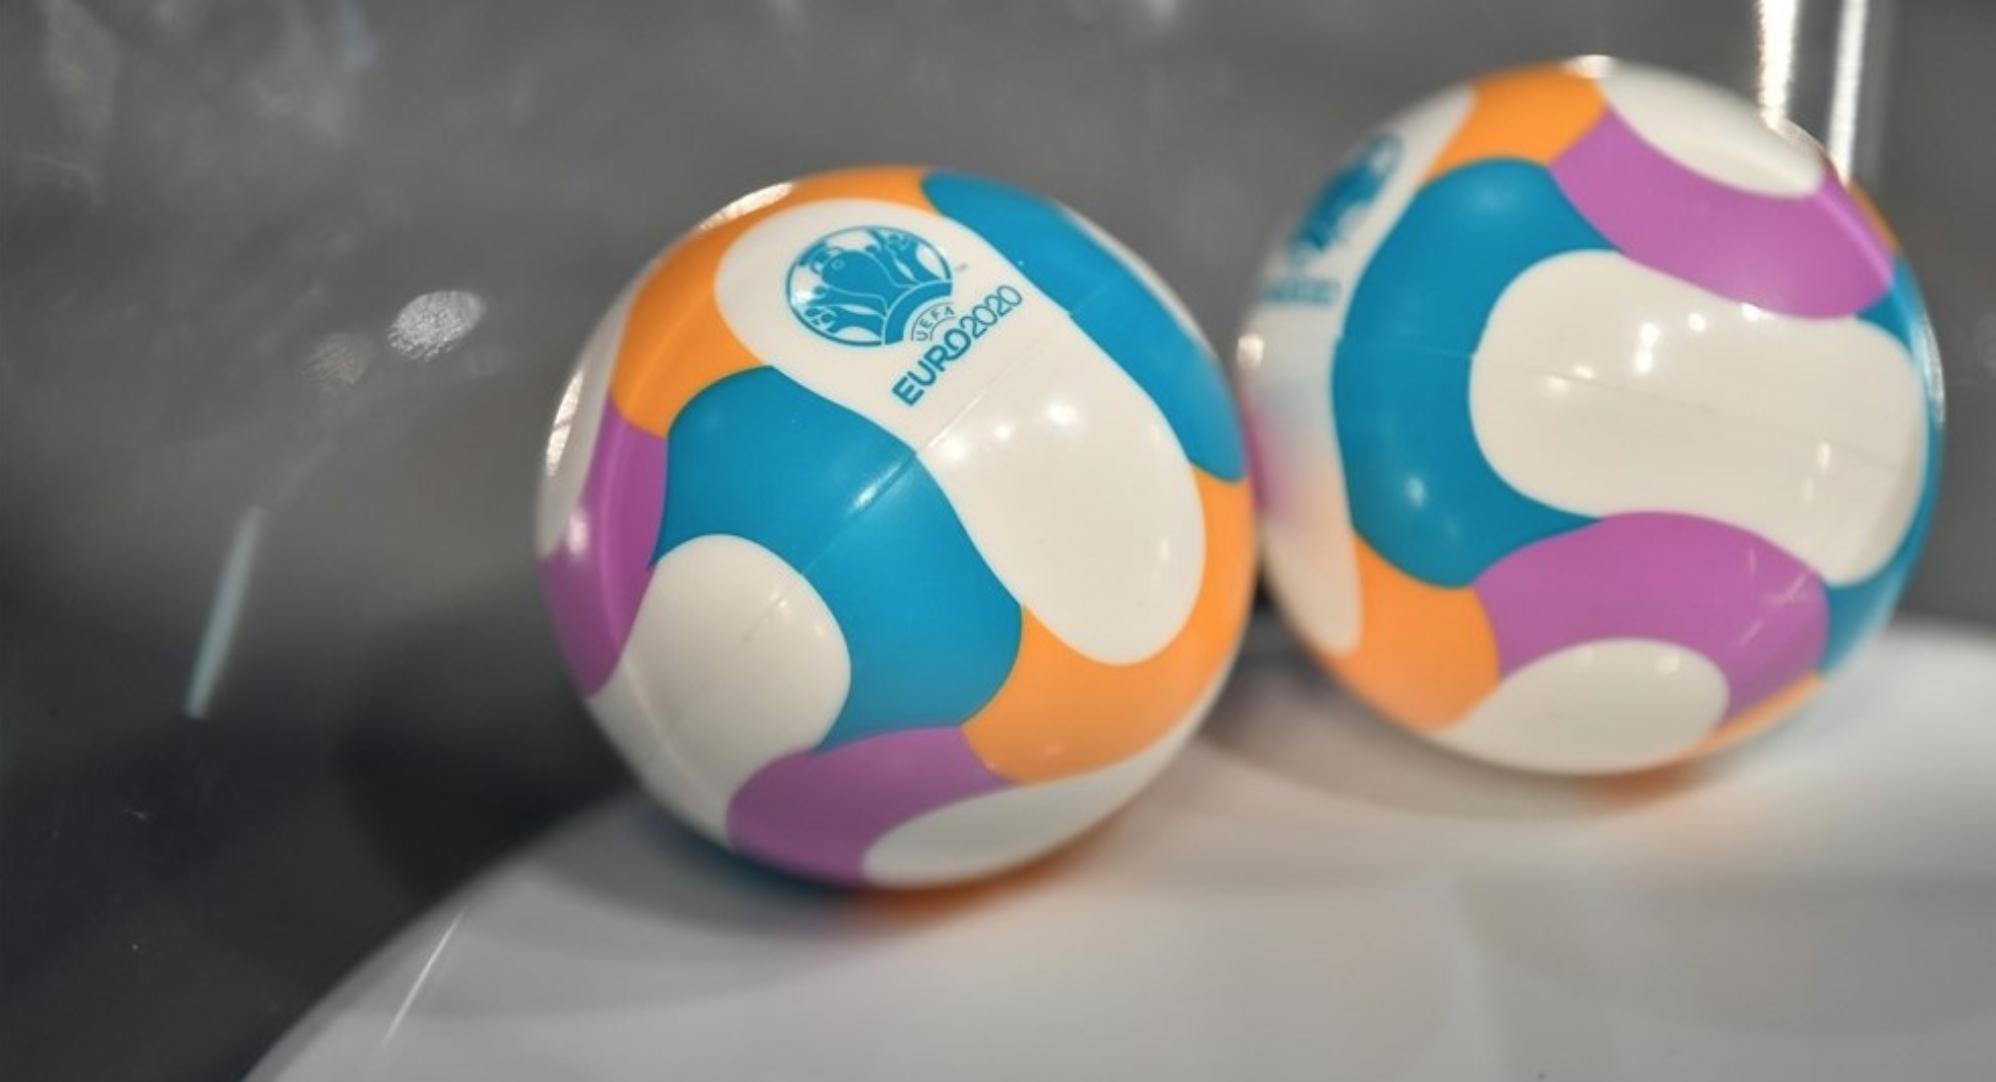 Fai: Euro 2020 Draw Set For Dublin